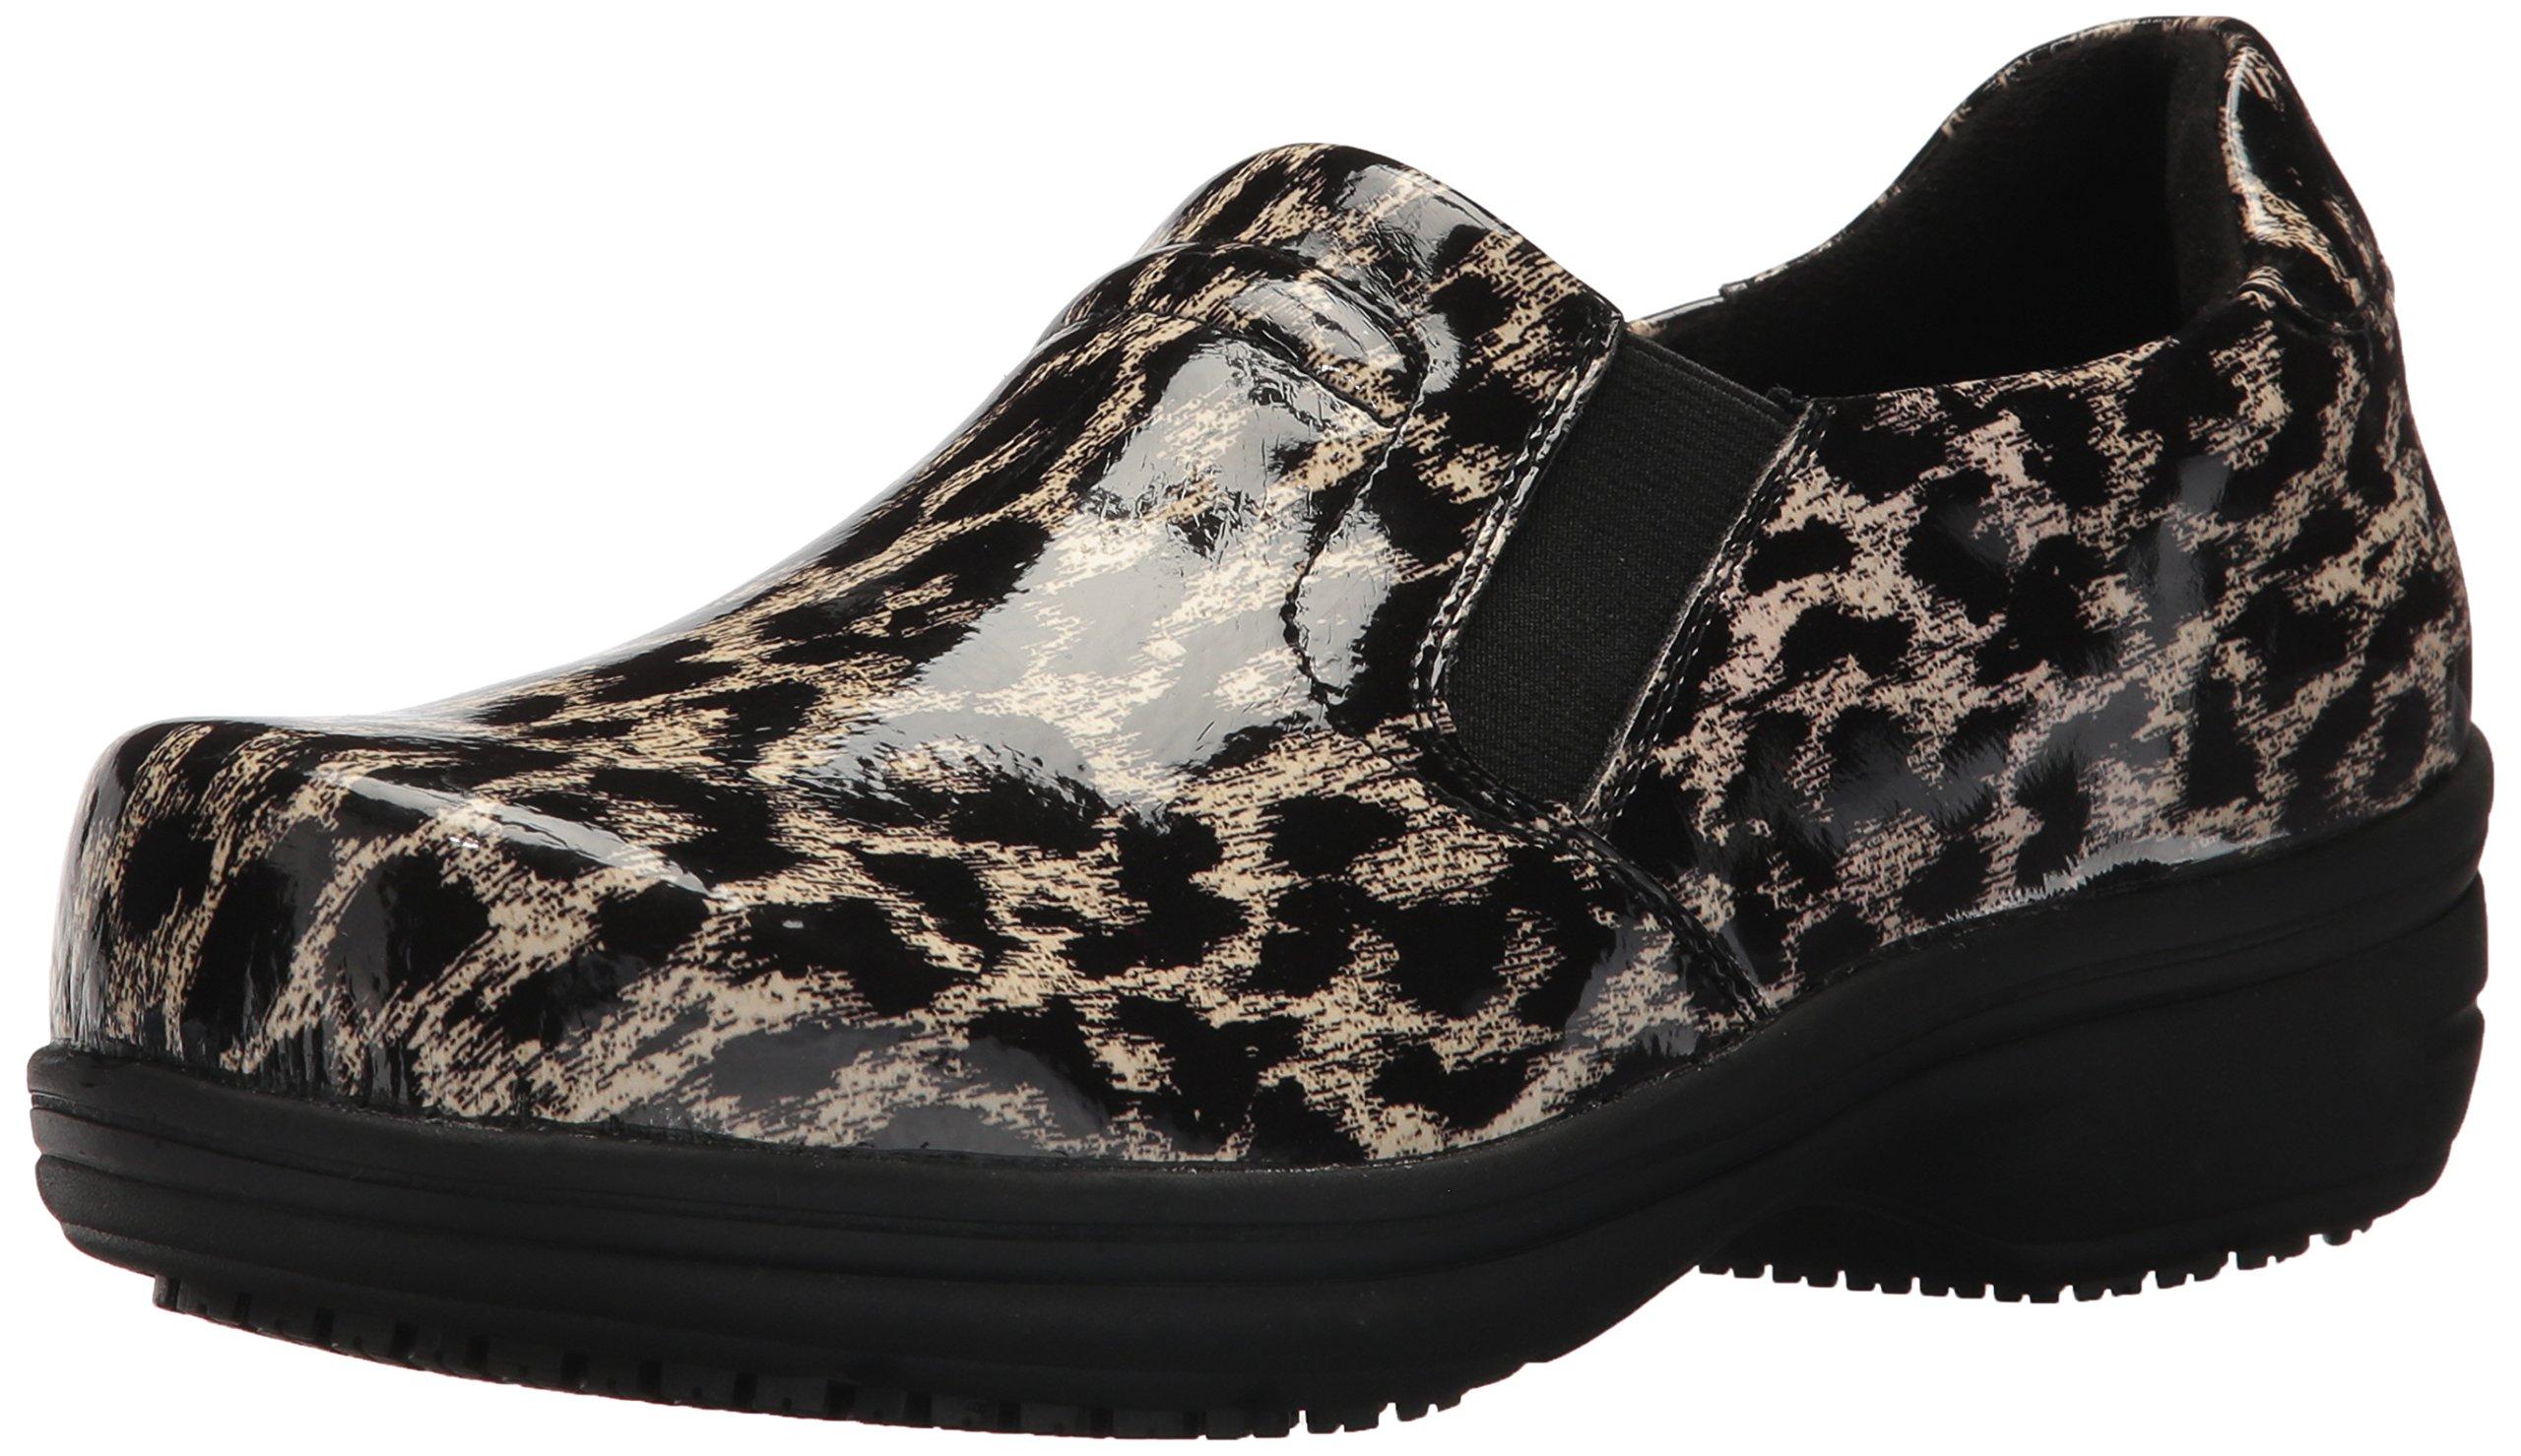 Easy Works Women's Bind Health Care Professional Shoe, Beige Leopard, 12 2W US by Easy Works